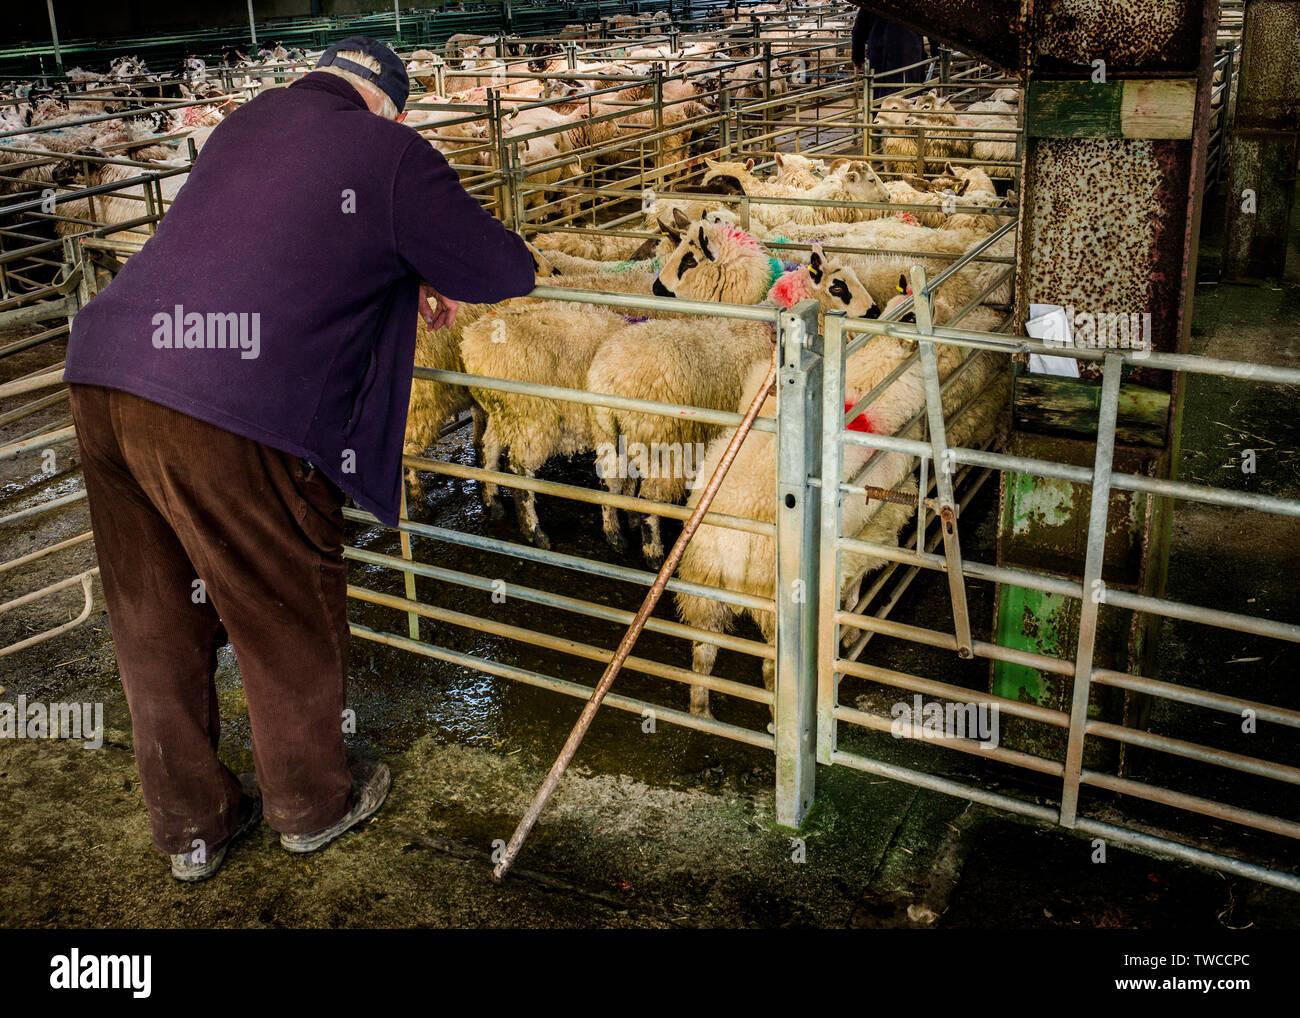 Hallworthy Stockyard, Kivells livestock market Cornwall Stock Photo